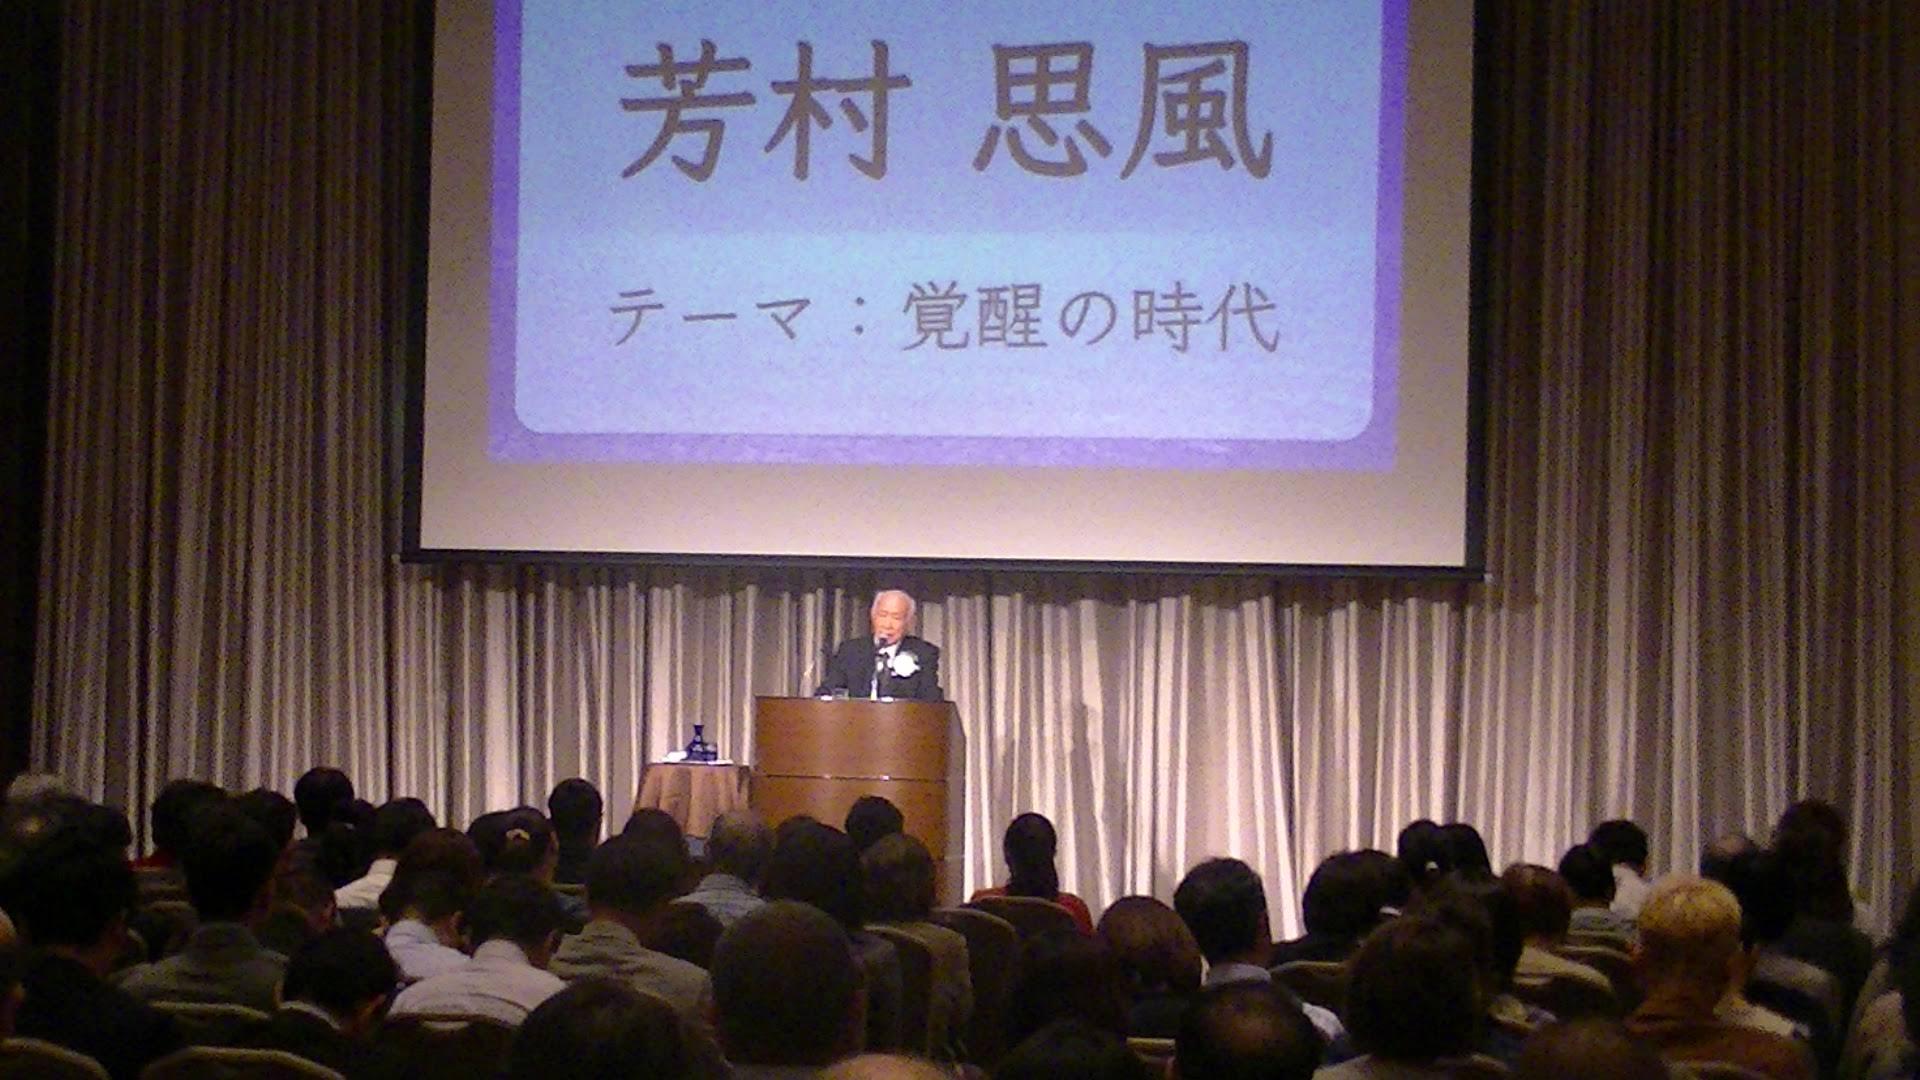 PIC 1690 1 - 思風会全国大会in広島